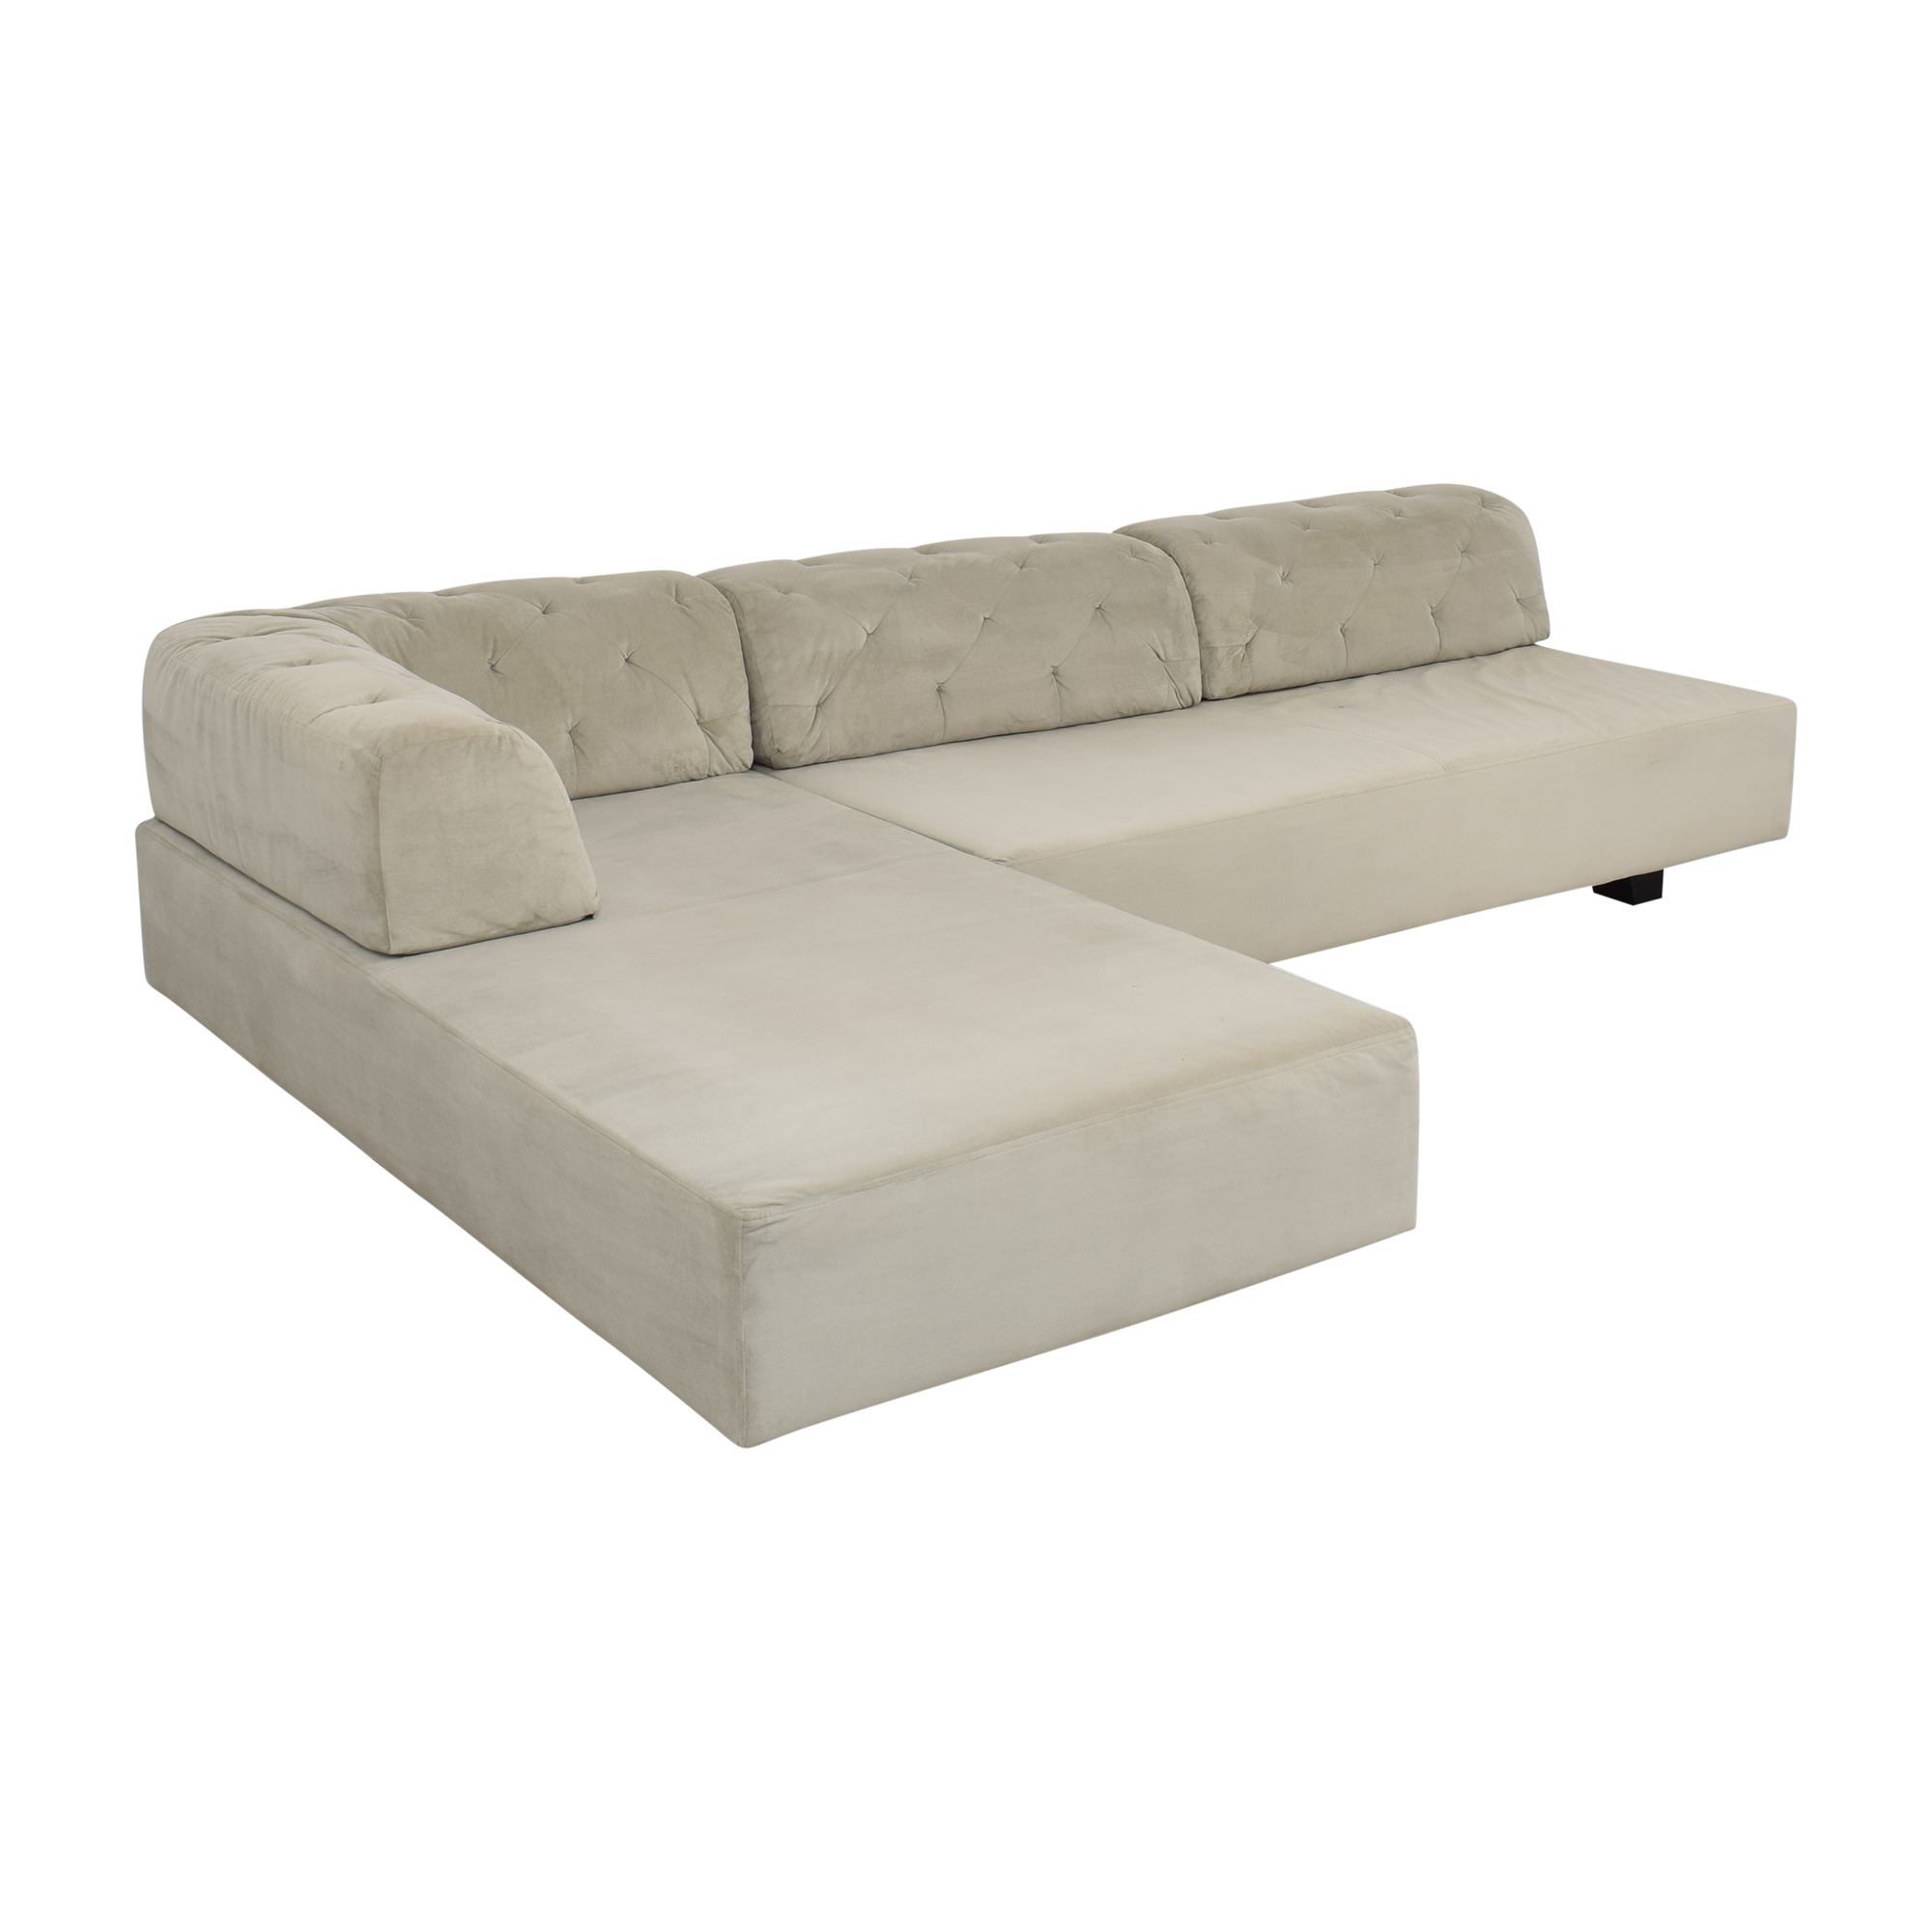 West Elm Tillary Tufted Sectional Sofa / Sofas